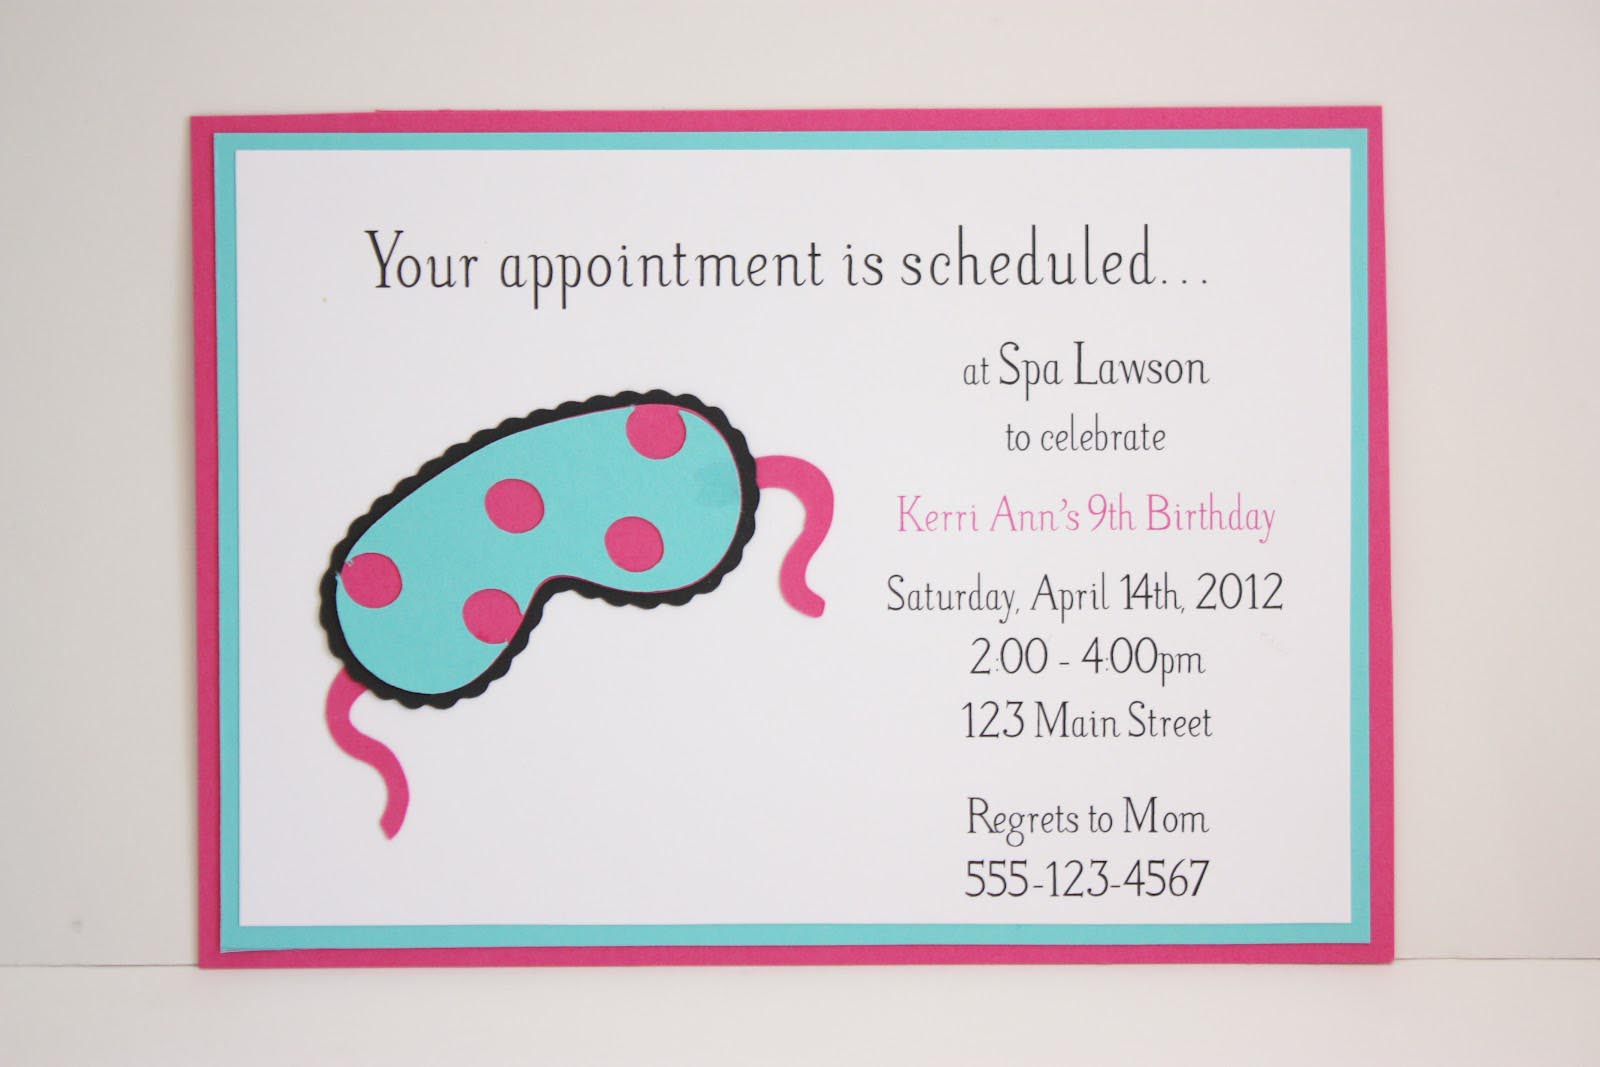 Spa Birthday Party Invitations Free Printable | Home Party Ideas - Free Printable Spa Party Invitations Templates